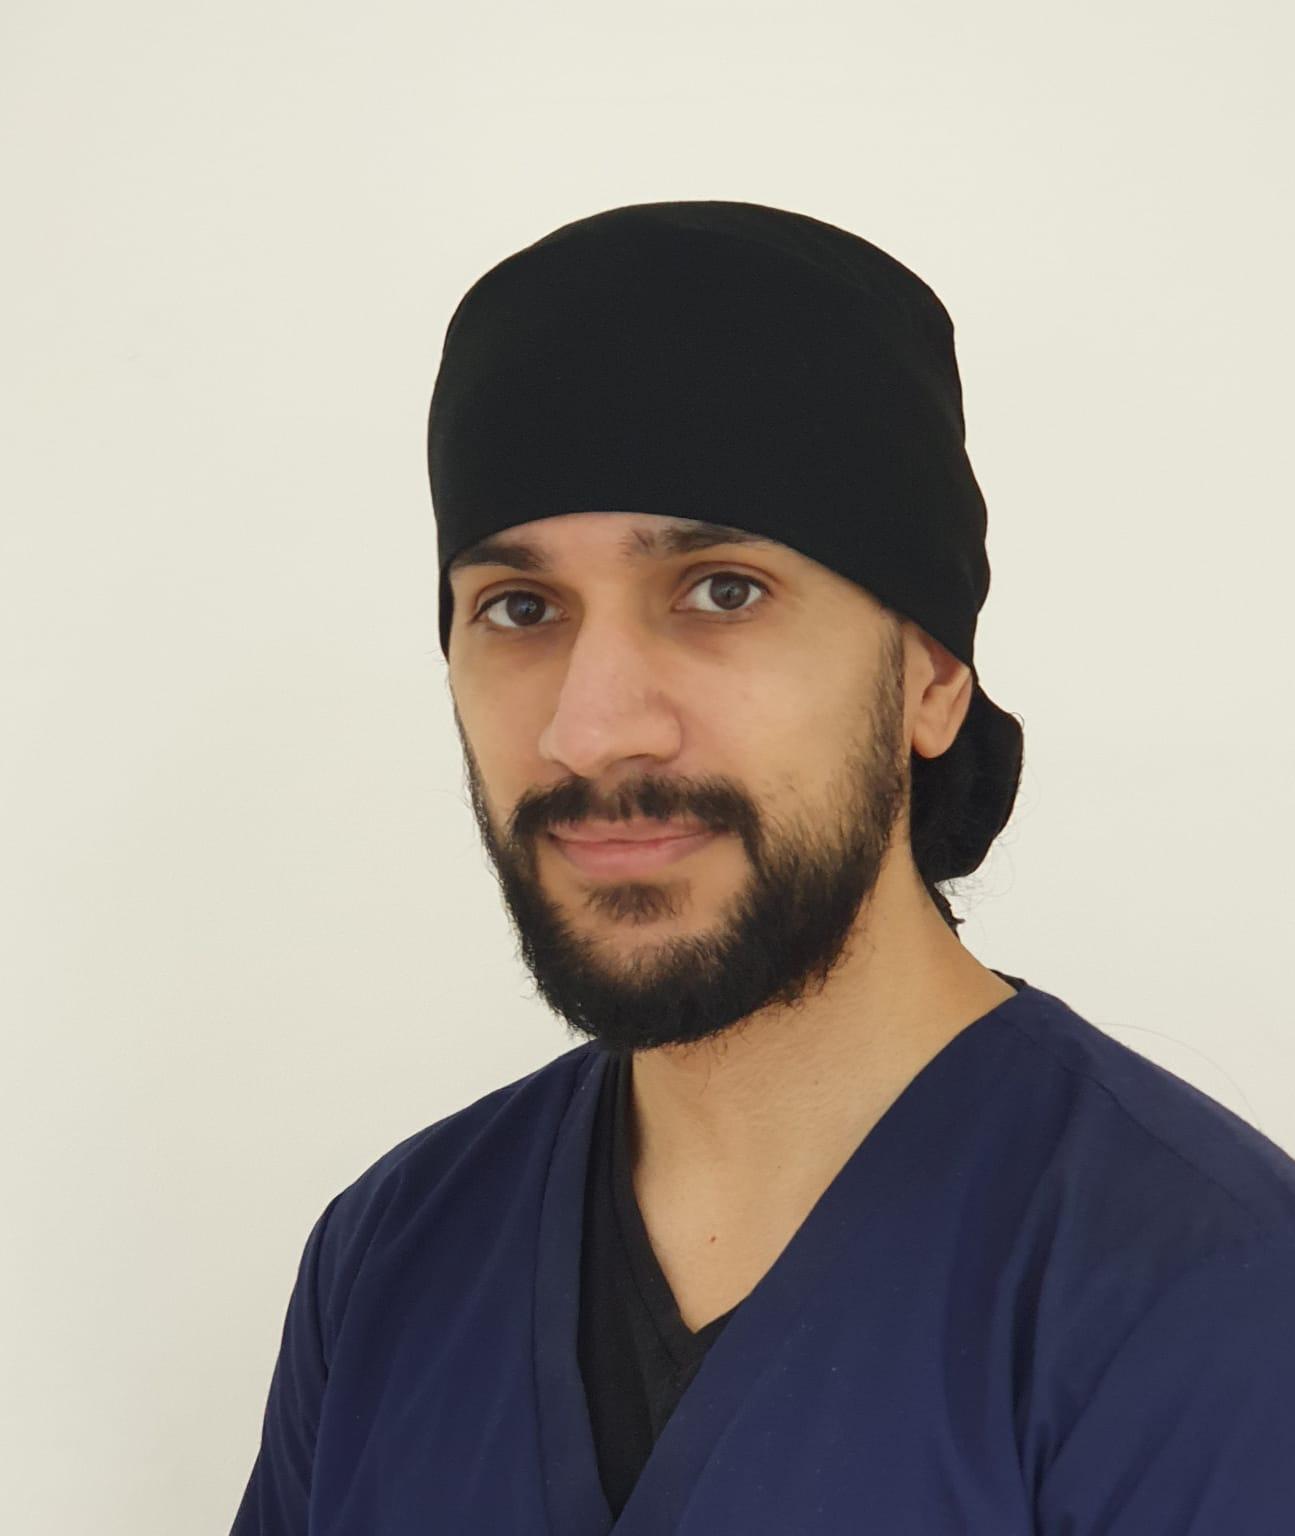 Dr Mandeep Virdee is a Dentist at Etwall Dental Practice